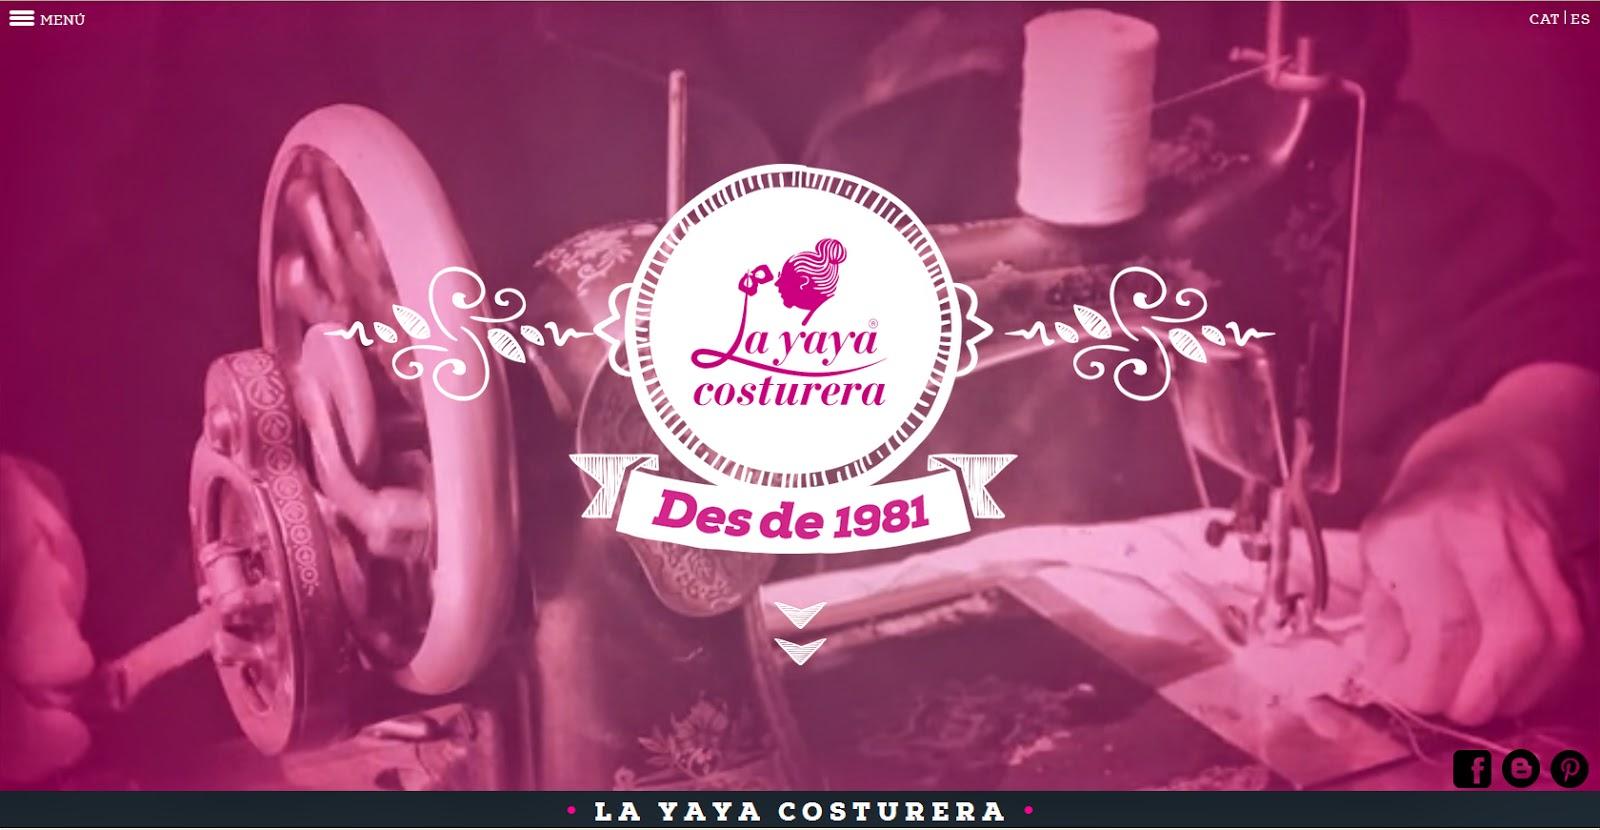 http://www.layayacosturera.com/ca